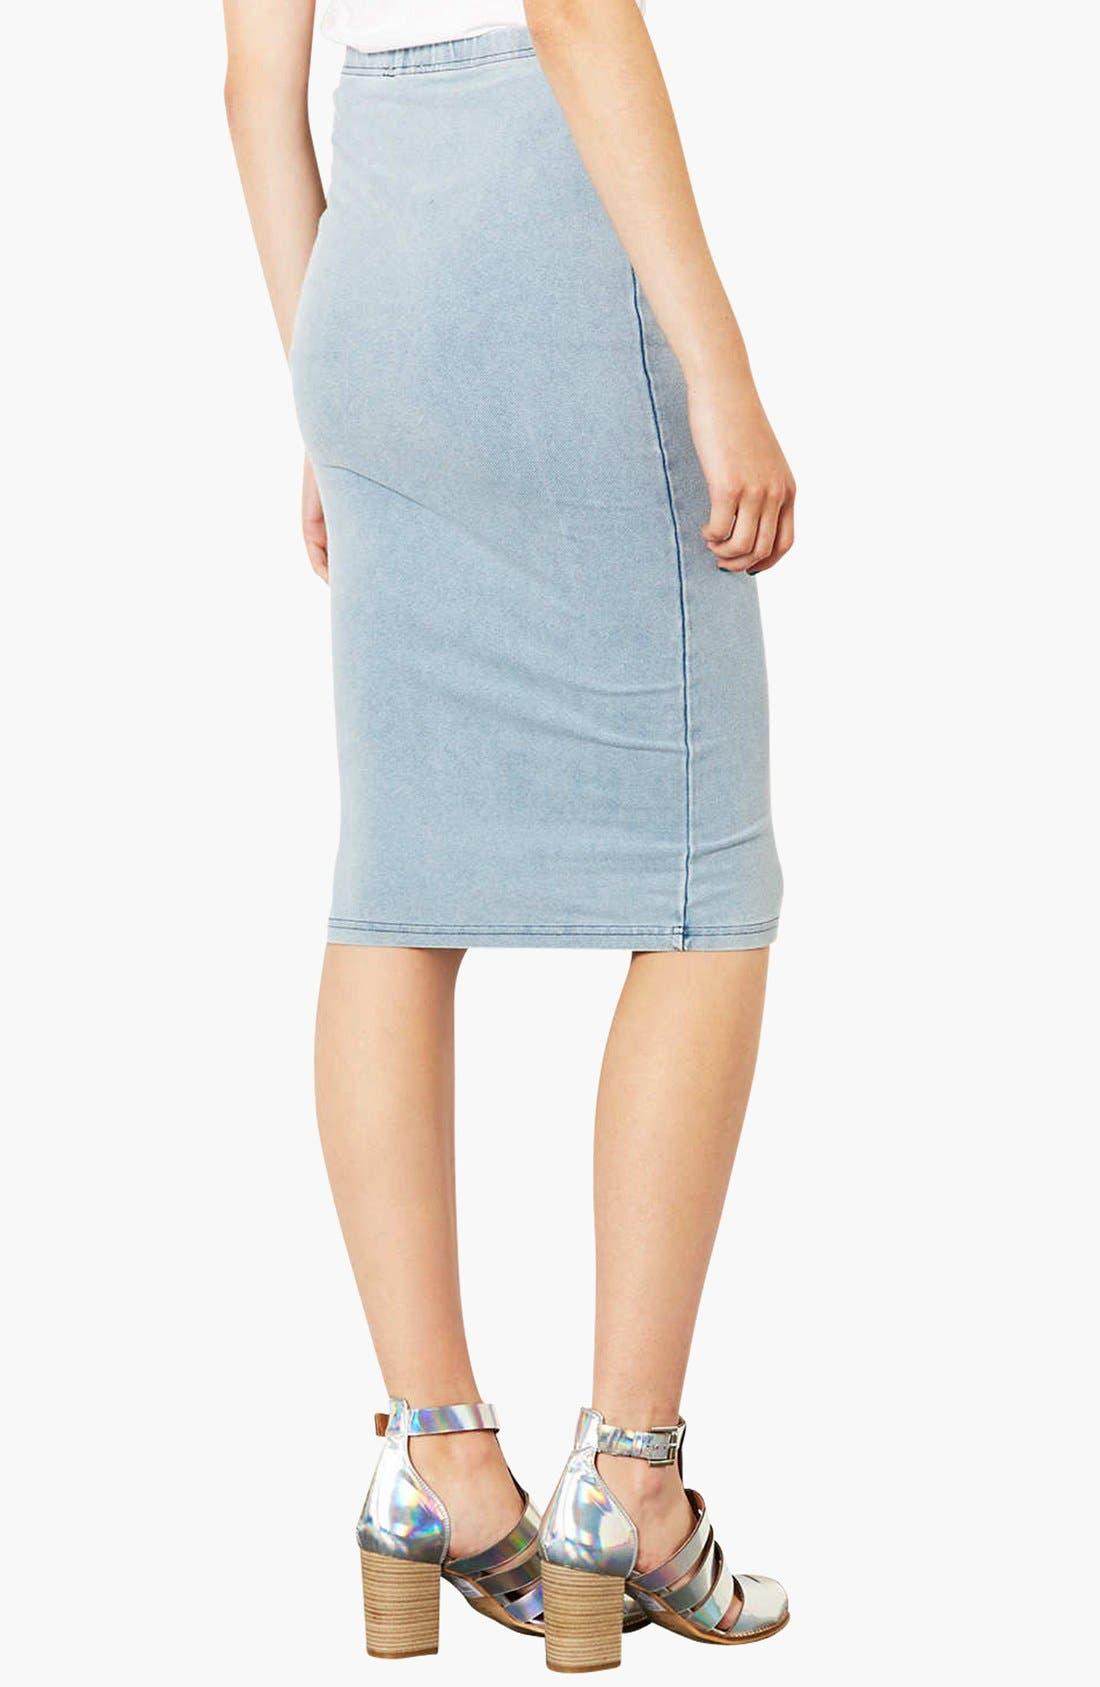 Alternate Image 2  - Topshop 'Denim Look' Tube Skirt